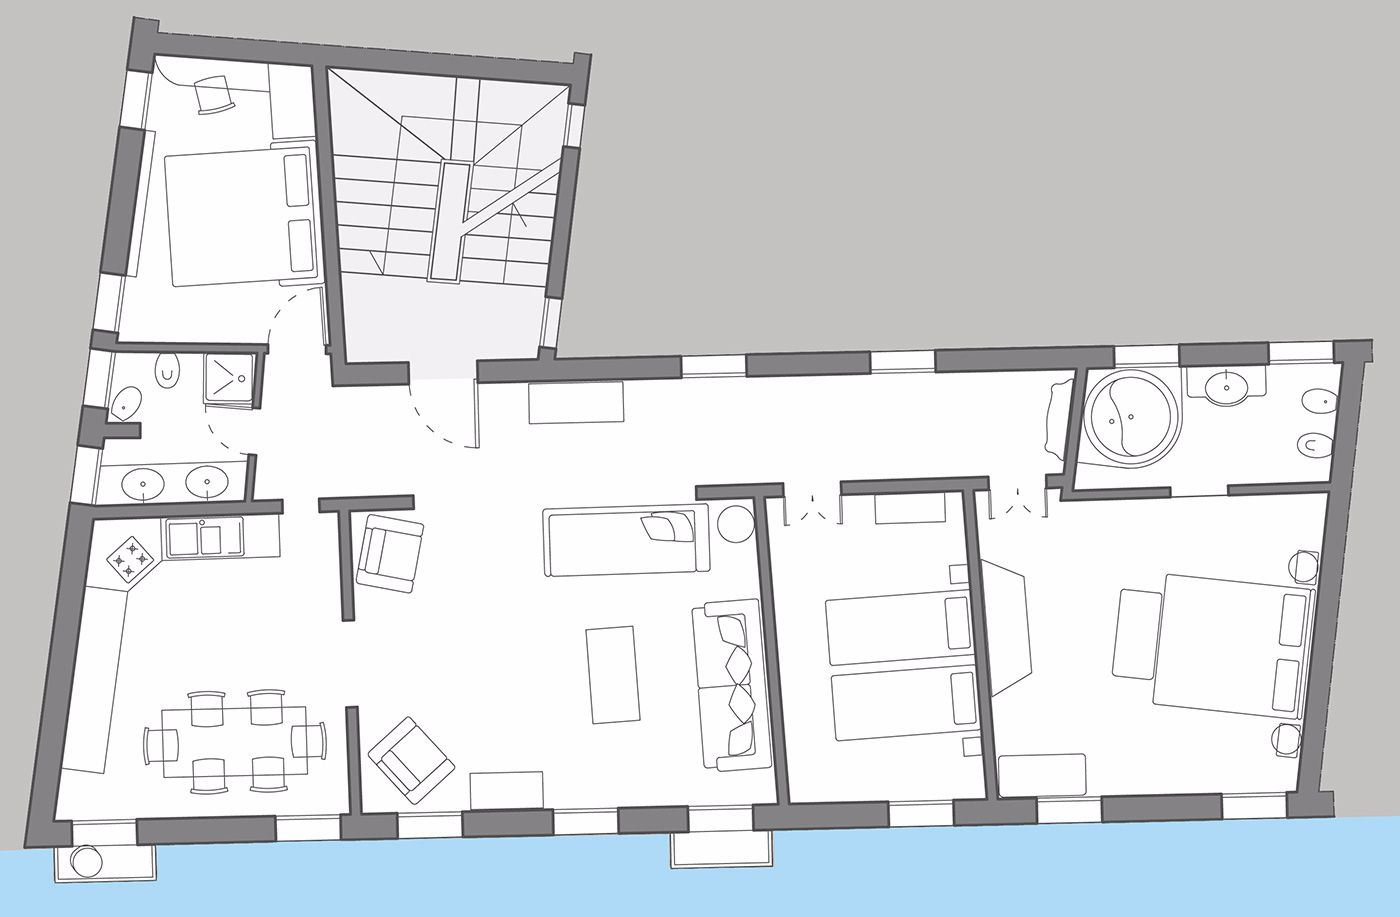 Da Vinci floor plan